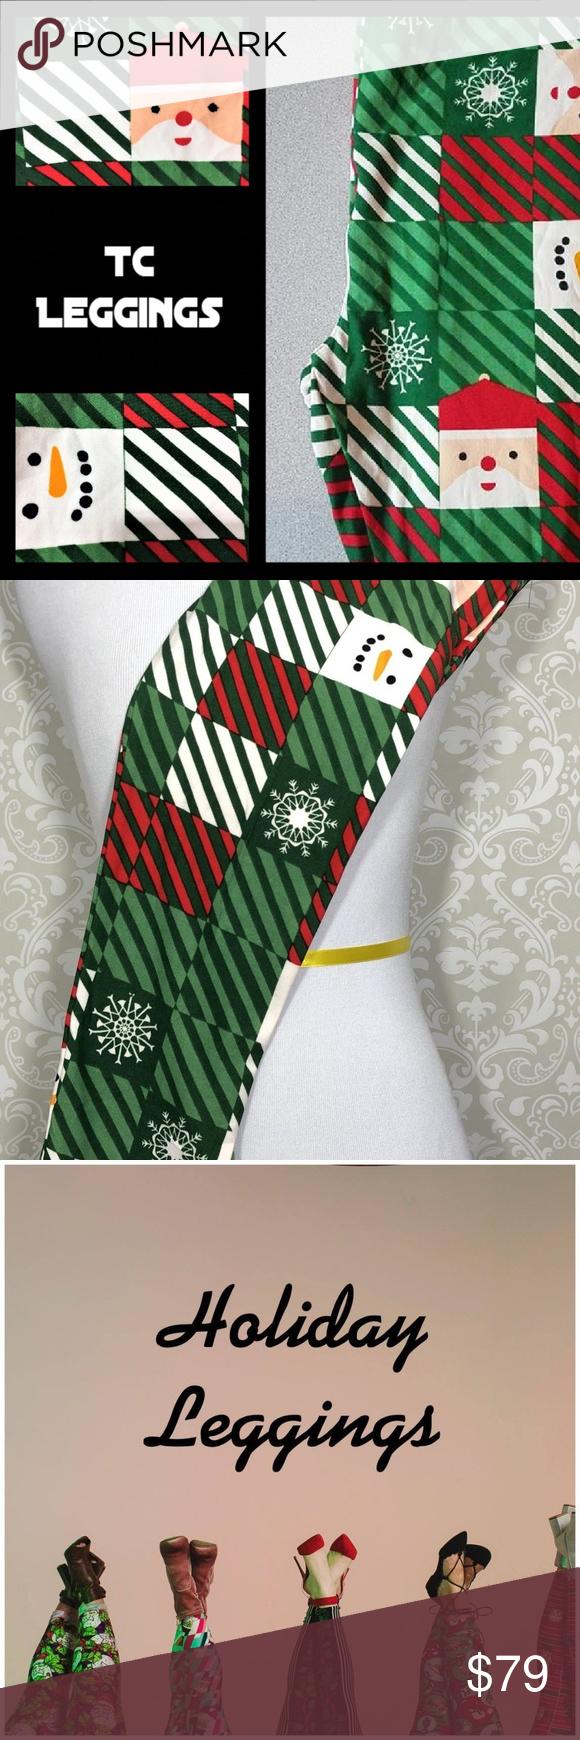 e9ac56fe9cc5f3 NEW Lularoe TC Leggings 🎅 Santa Snowman Snowflake ** SAME DAY SHIPPING &  HANDLING*